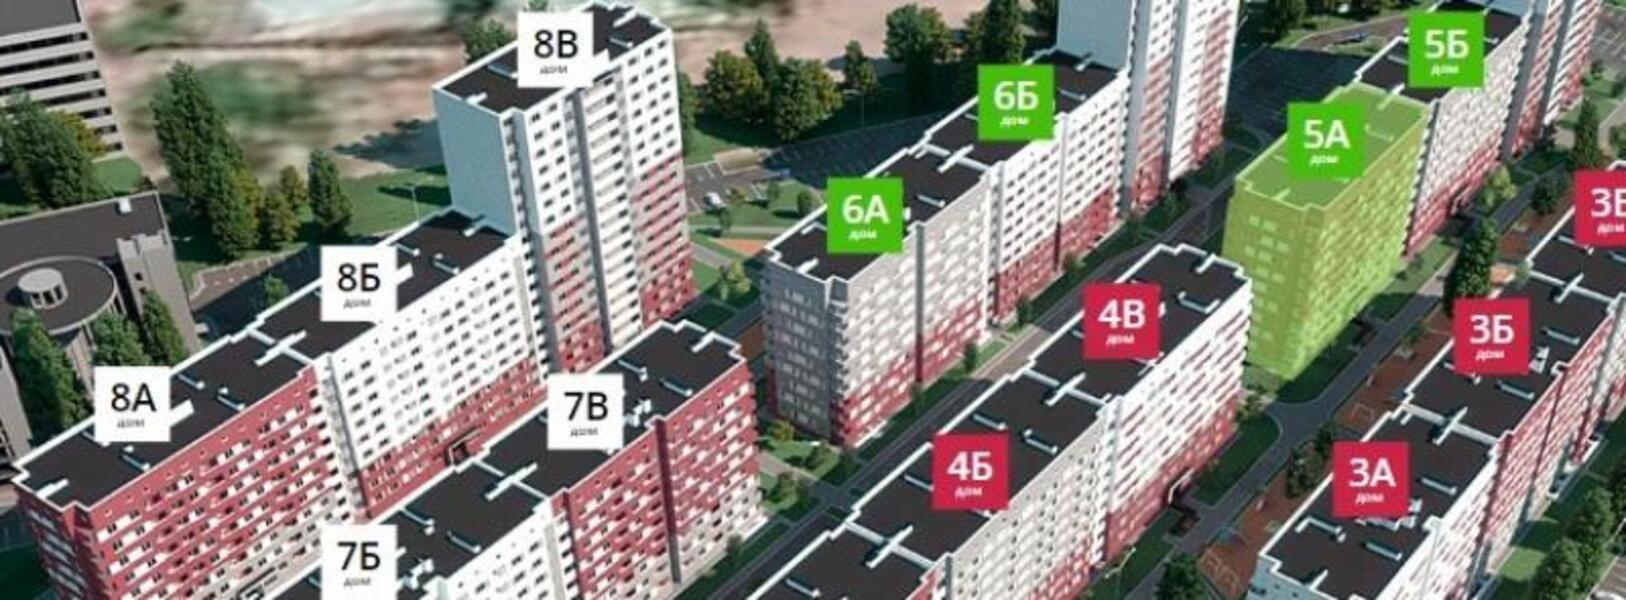 квартира, 1-комн., Харьков, Журавлевка, Шевченко (Советская)